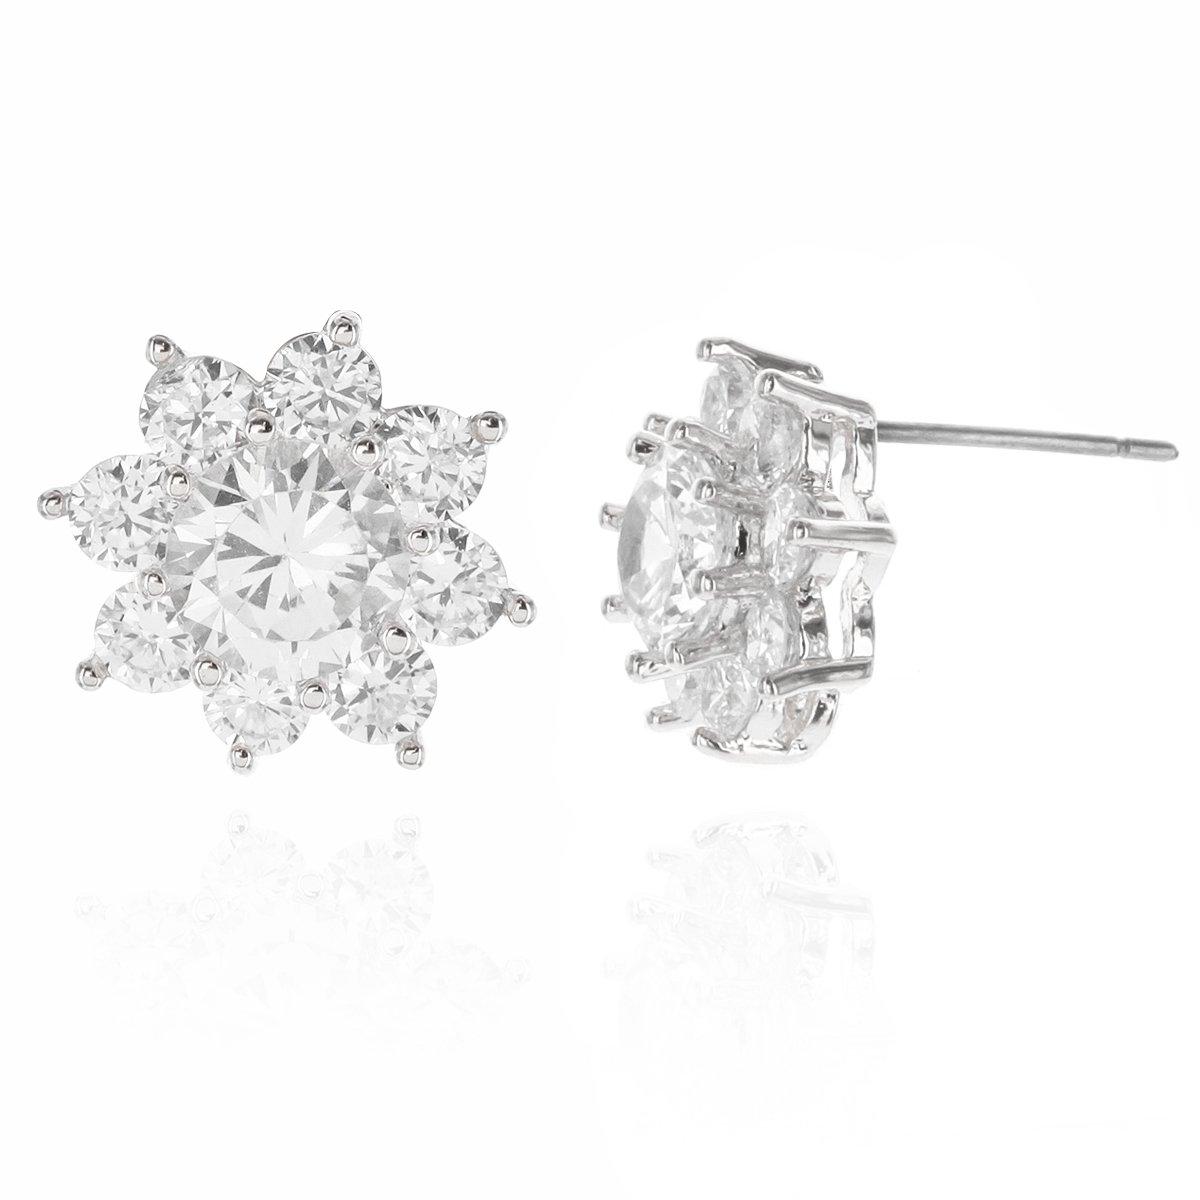 Flower Star Burst Round AAA Cubic Zirconia Women's Fashion Jewelry Accessories Stud Earrings